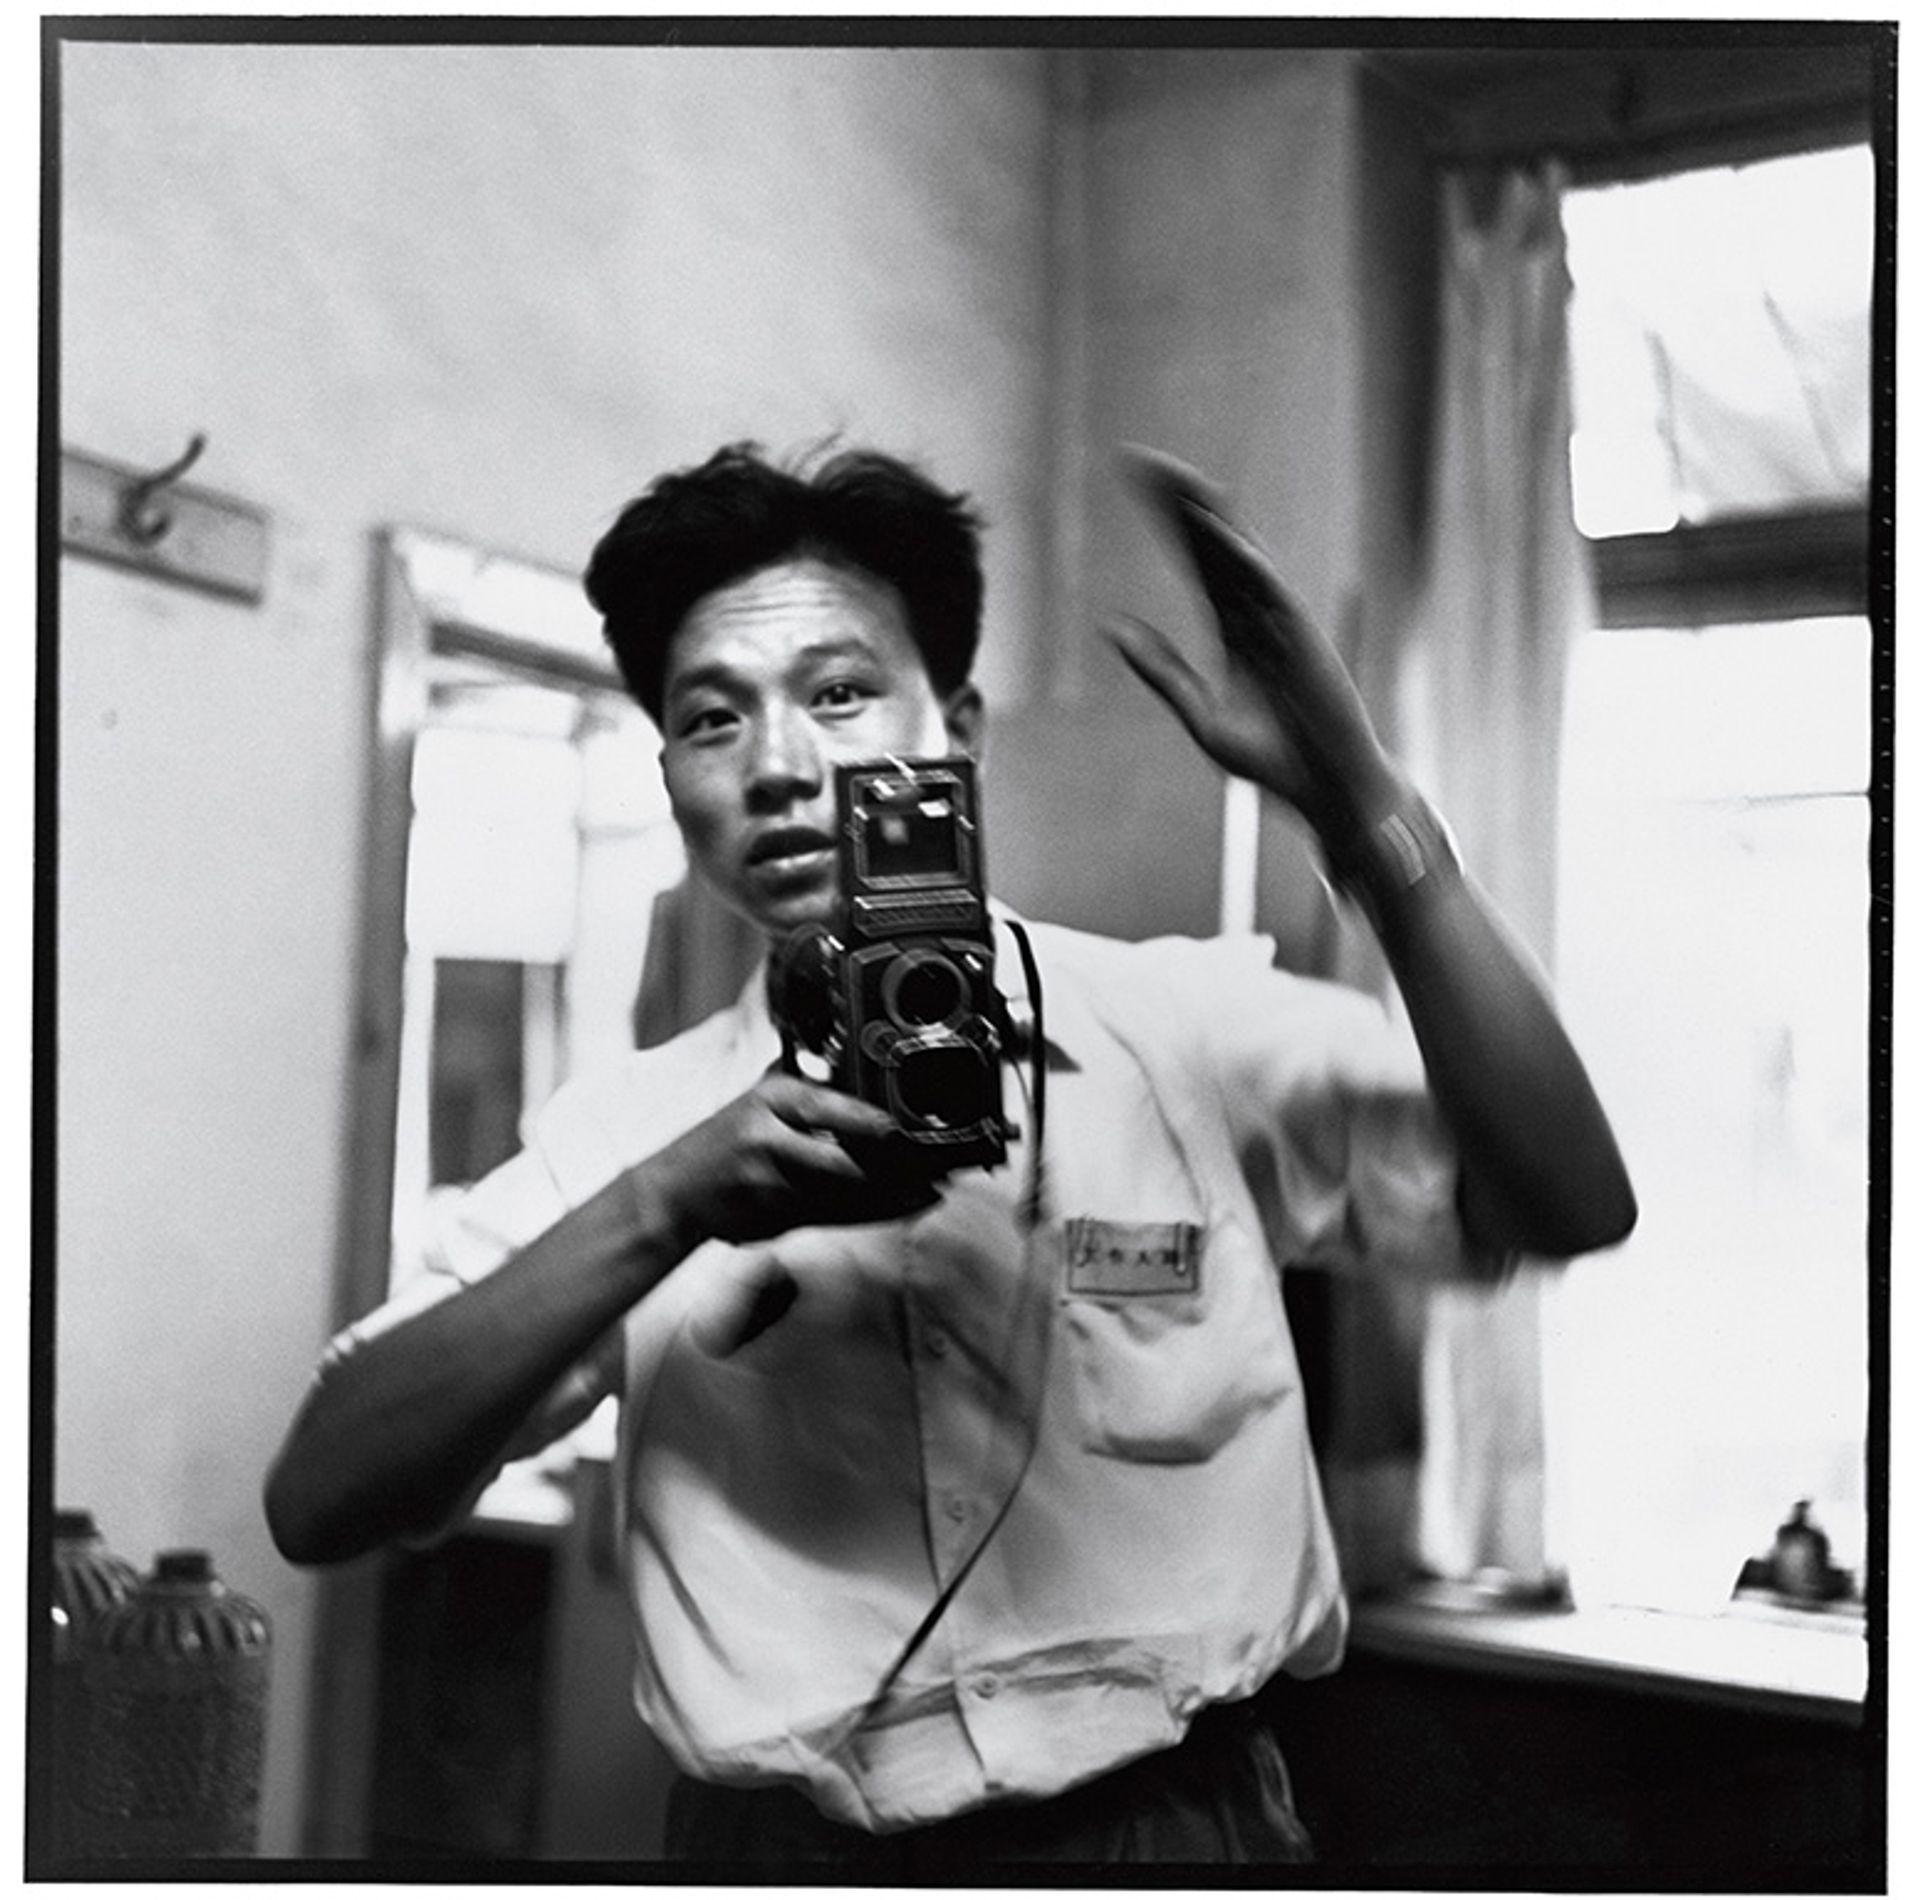 Self-portrait in the mirror, Harbin, July 1967 Credit: Li Zhensheng/Contact Press Images